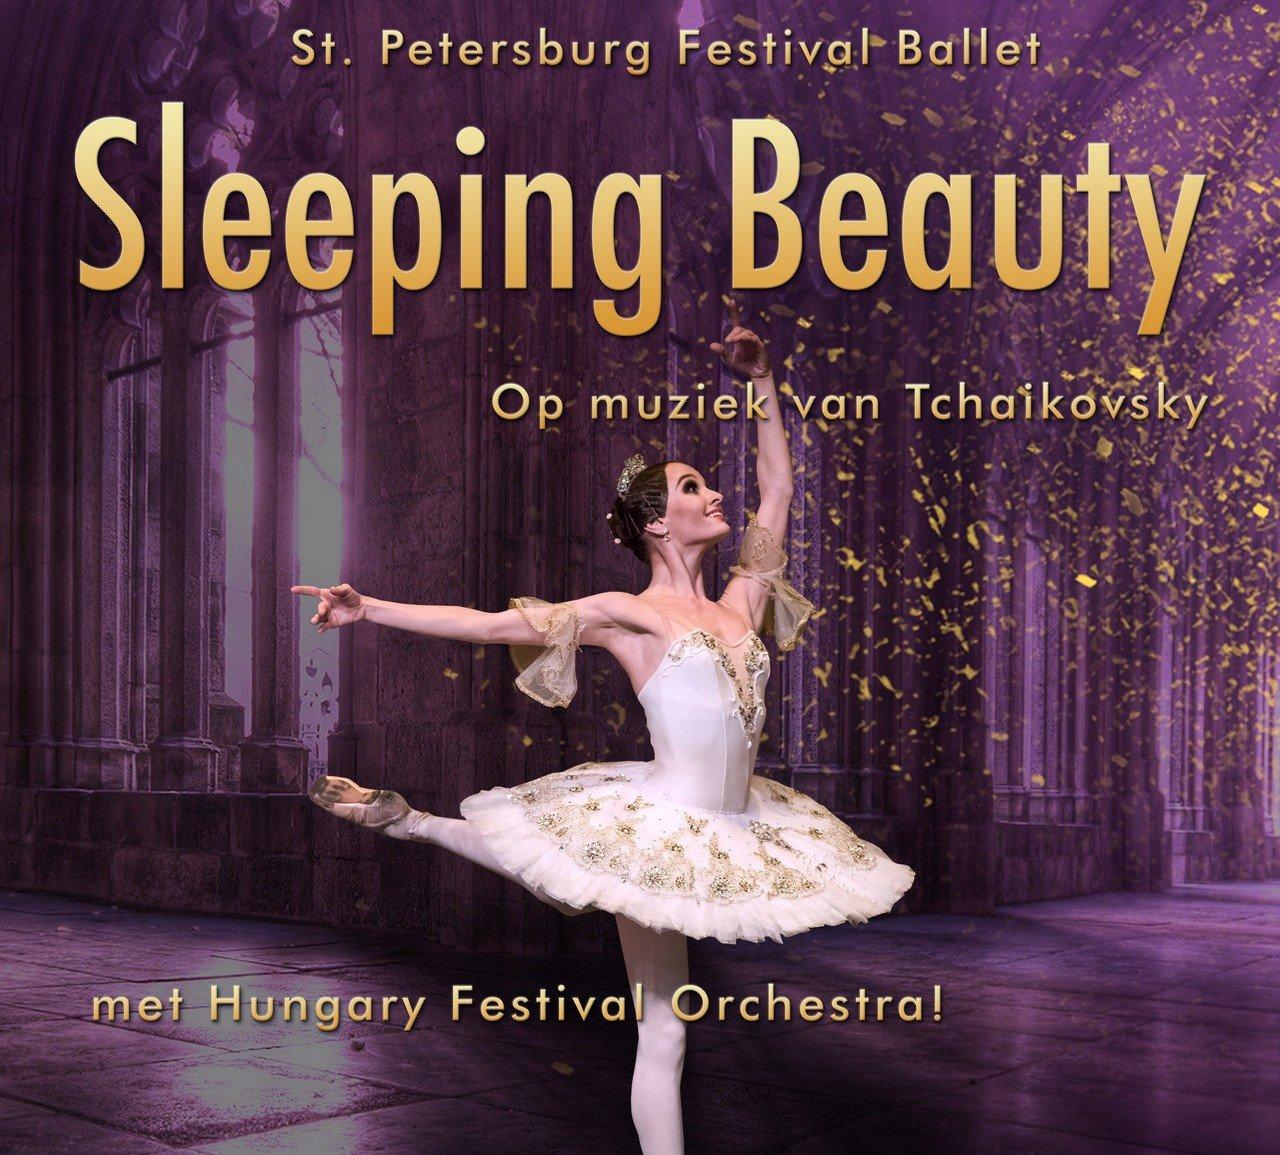 Sleeping Beauty in Gent, Vorst en Hasselt - Sleeping Beaty met Hungary festival Orchestra